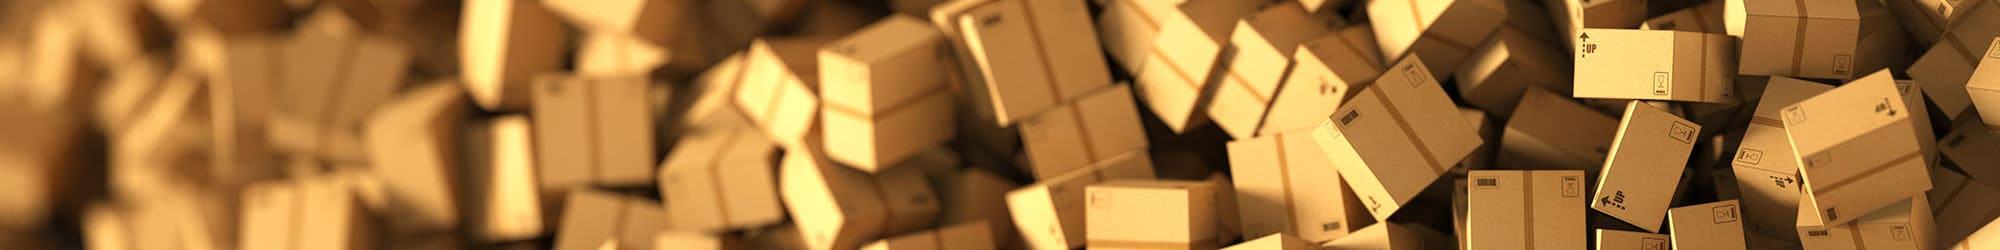 Contact Chillicothe Storage in Chillicothe, Ohio